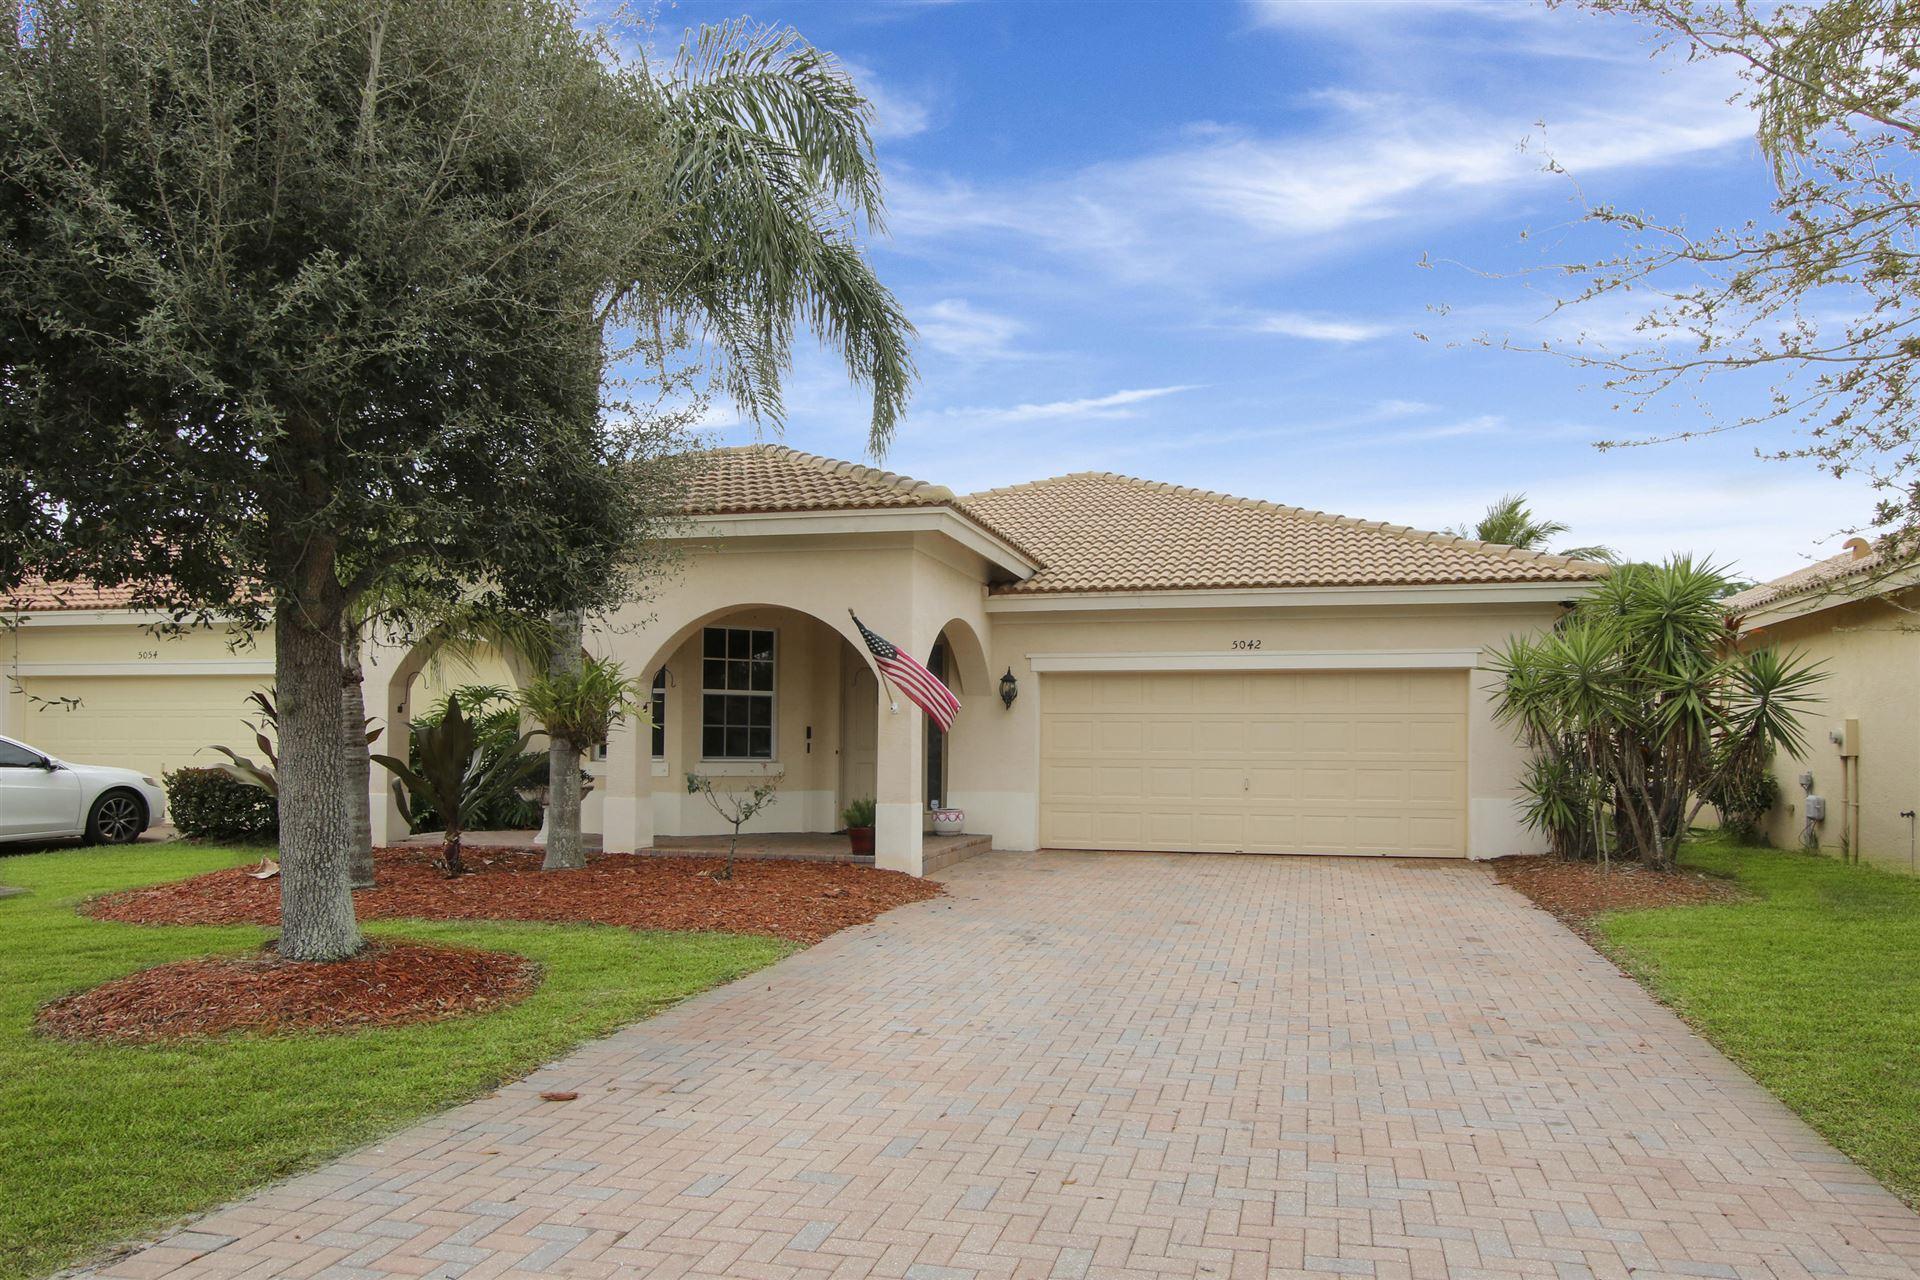 5042 SE Askew Avenue, Stuart, FL 34997 - #: RX-10698503